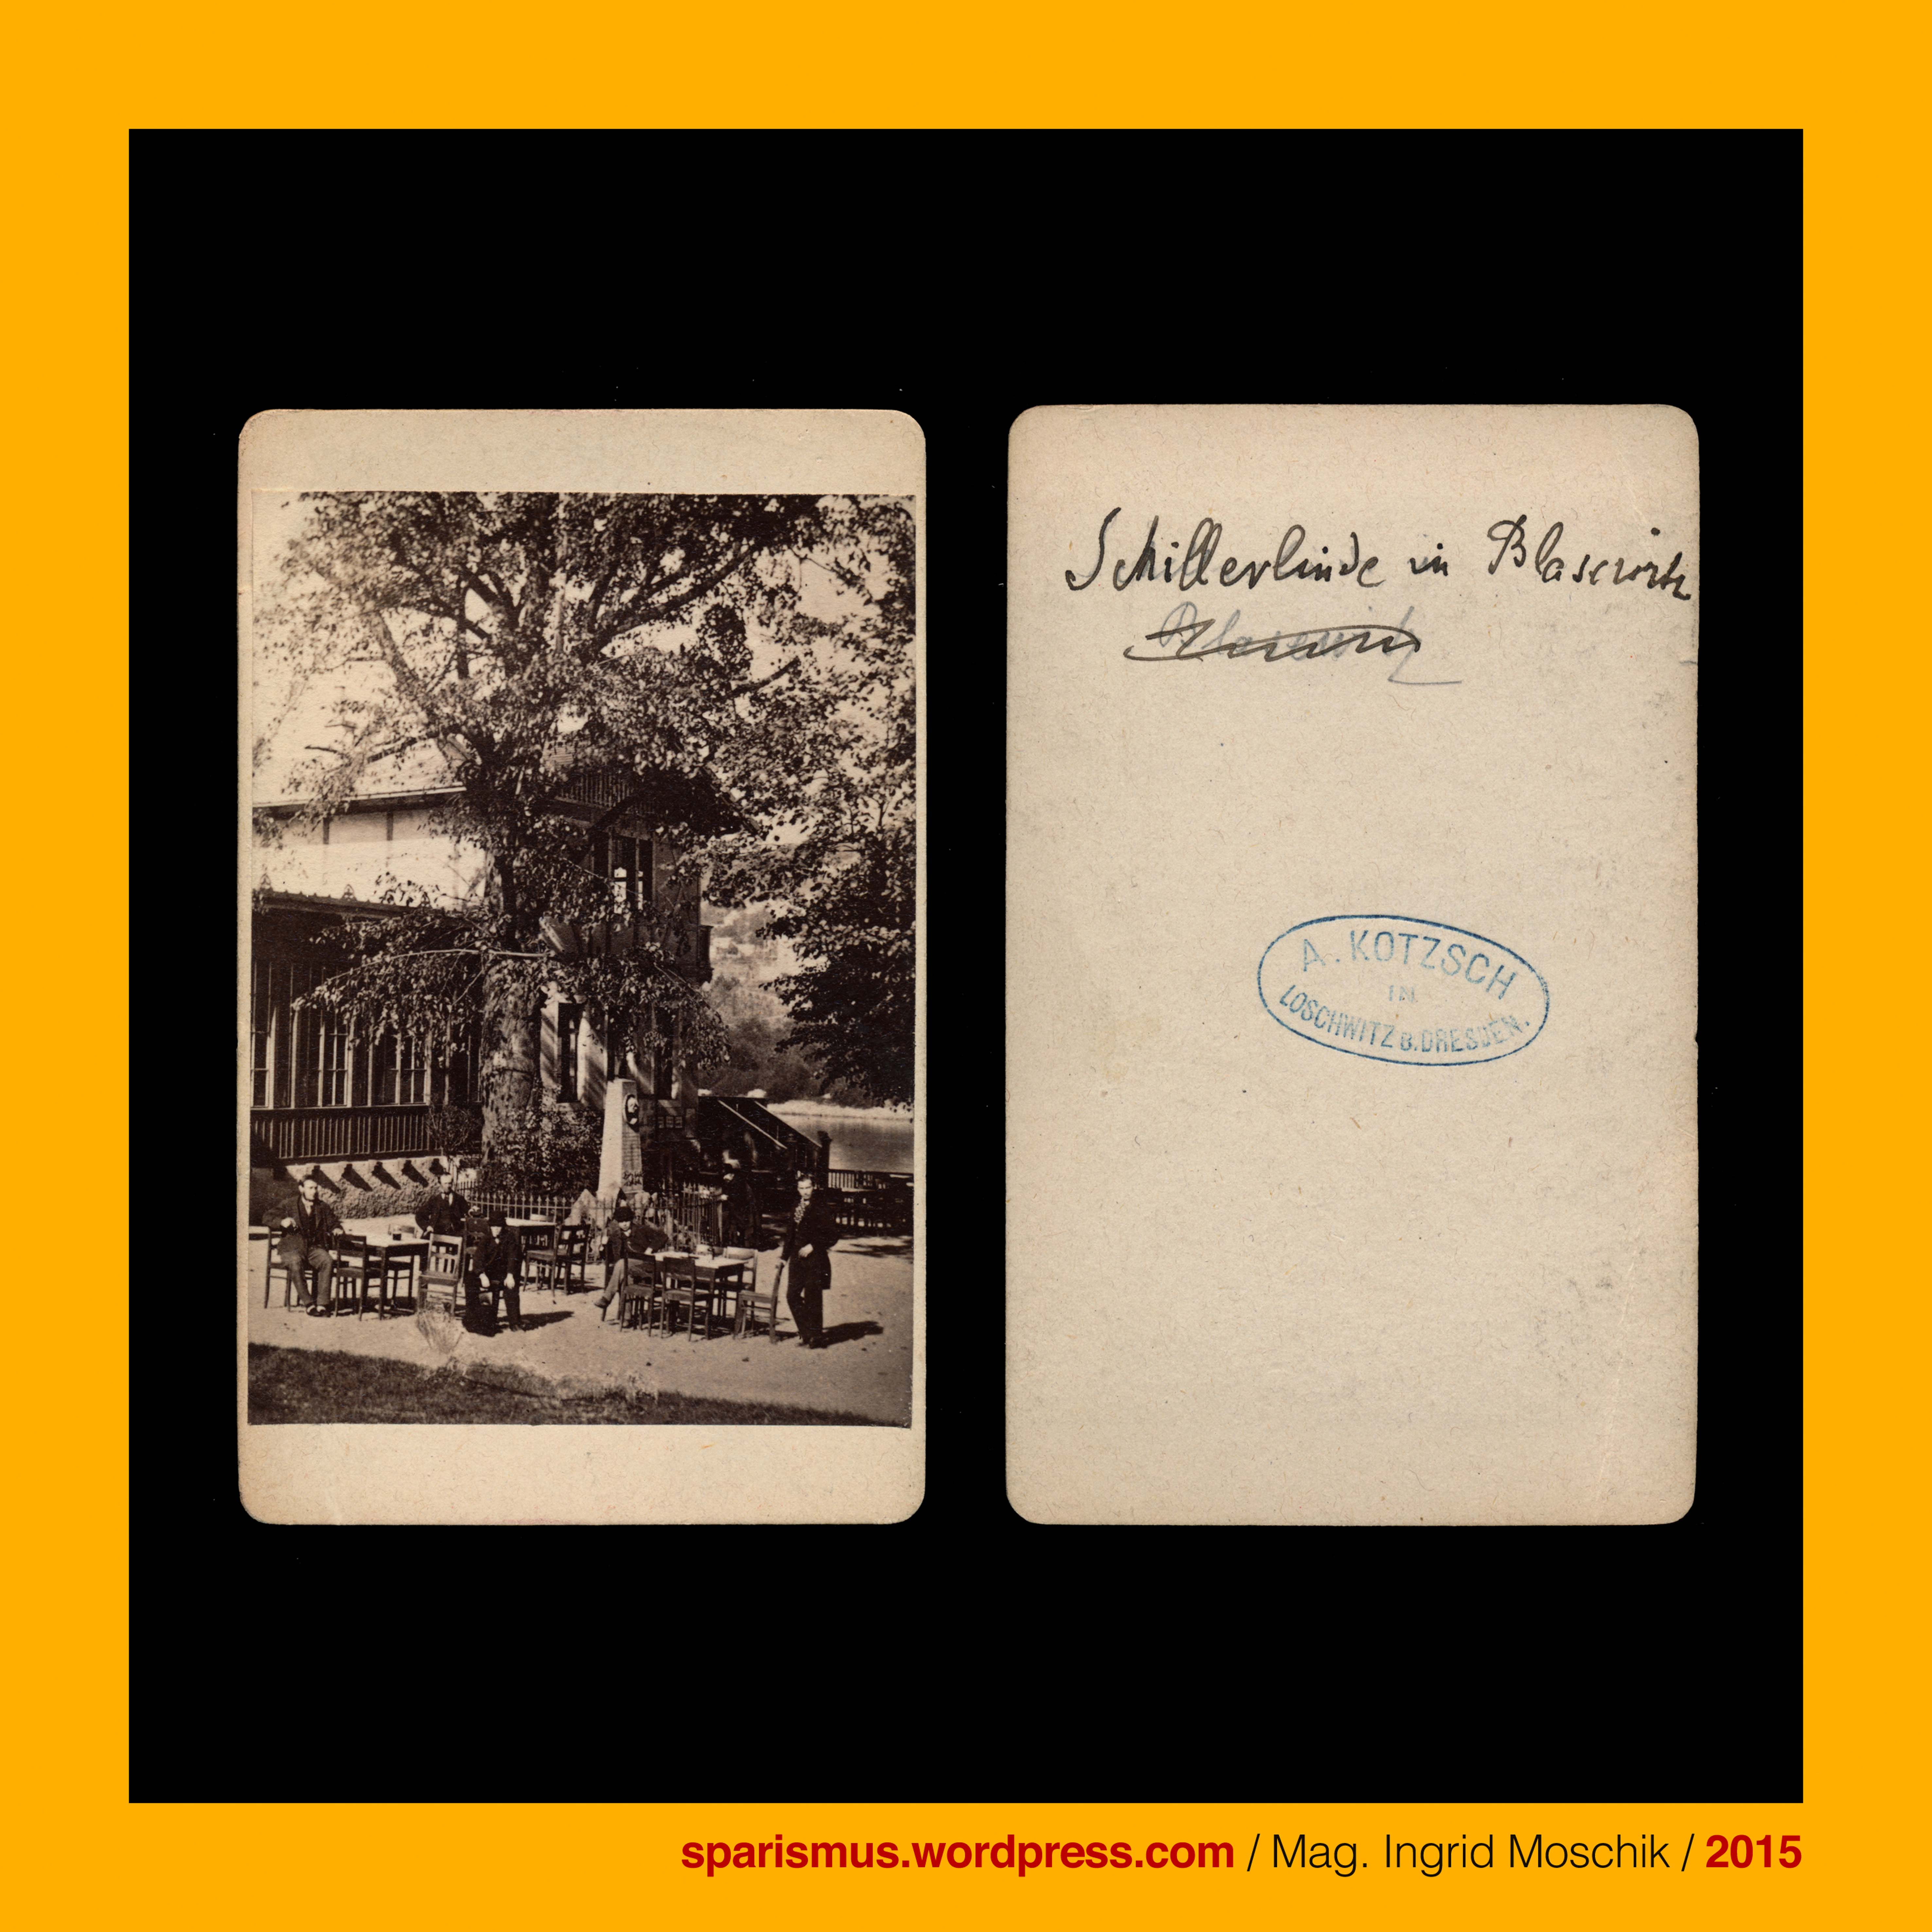 August Kotzsch, Photograph in Loschwitz bei Dresden, cdv, circa 1870 ...